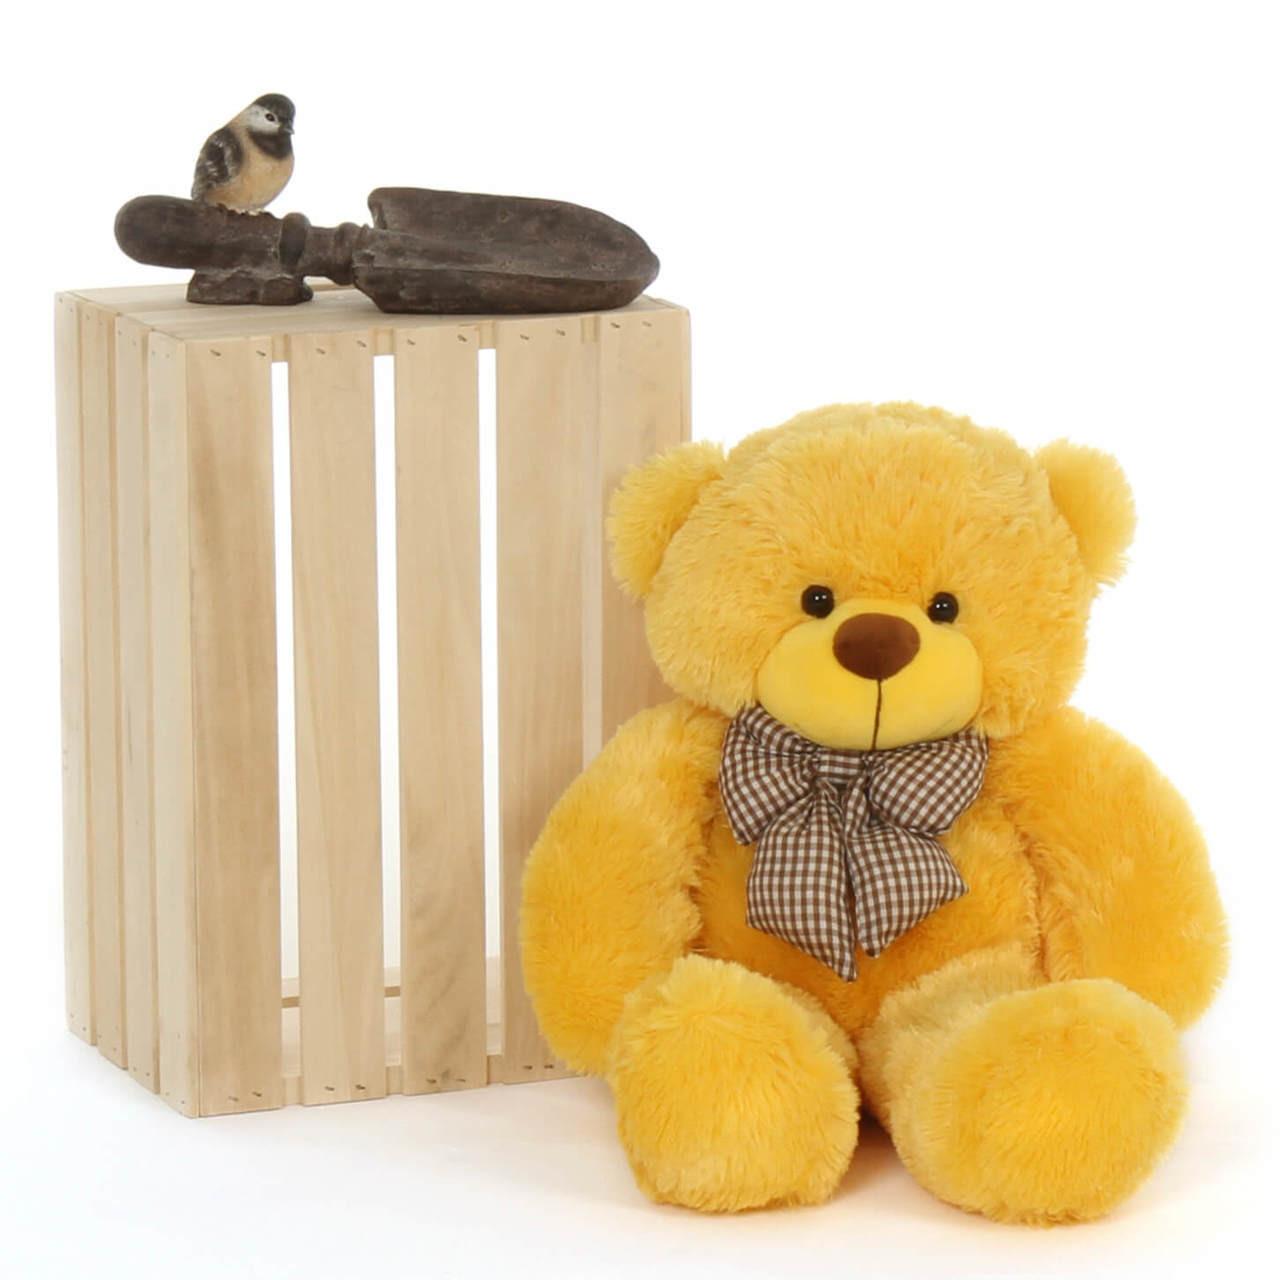 24in beautiful cuddly Yellow daisy giant Teddy Bear huggable